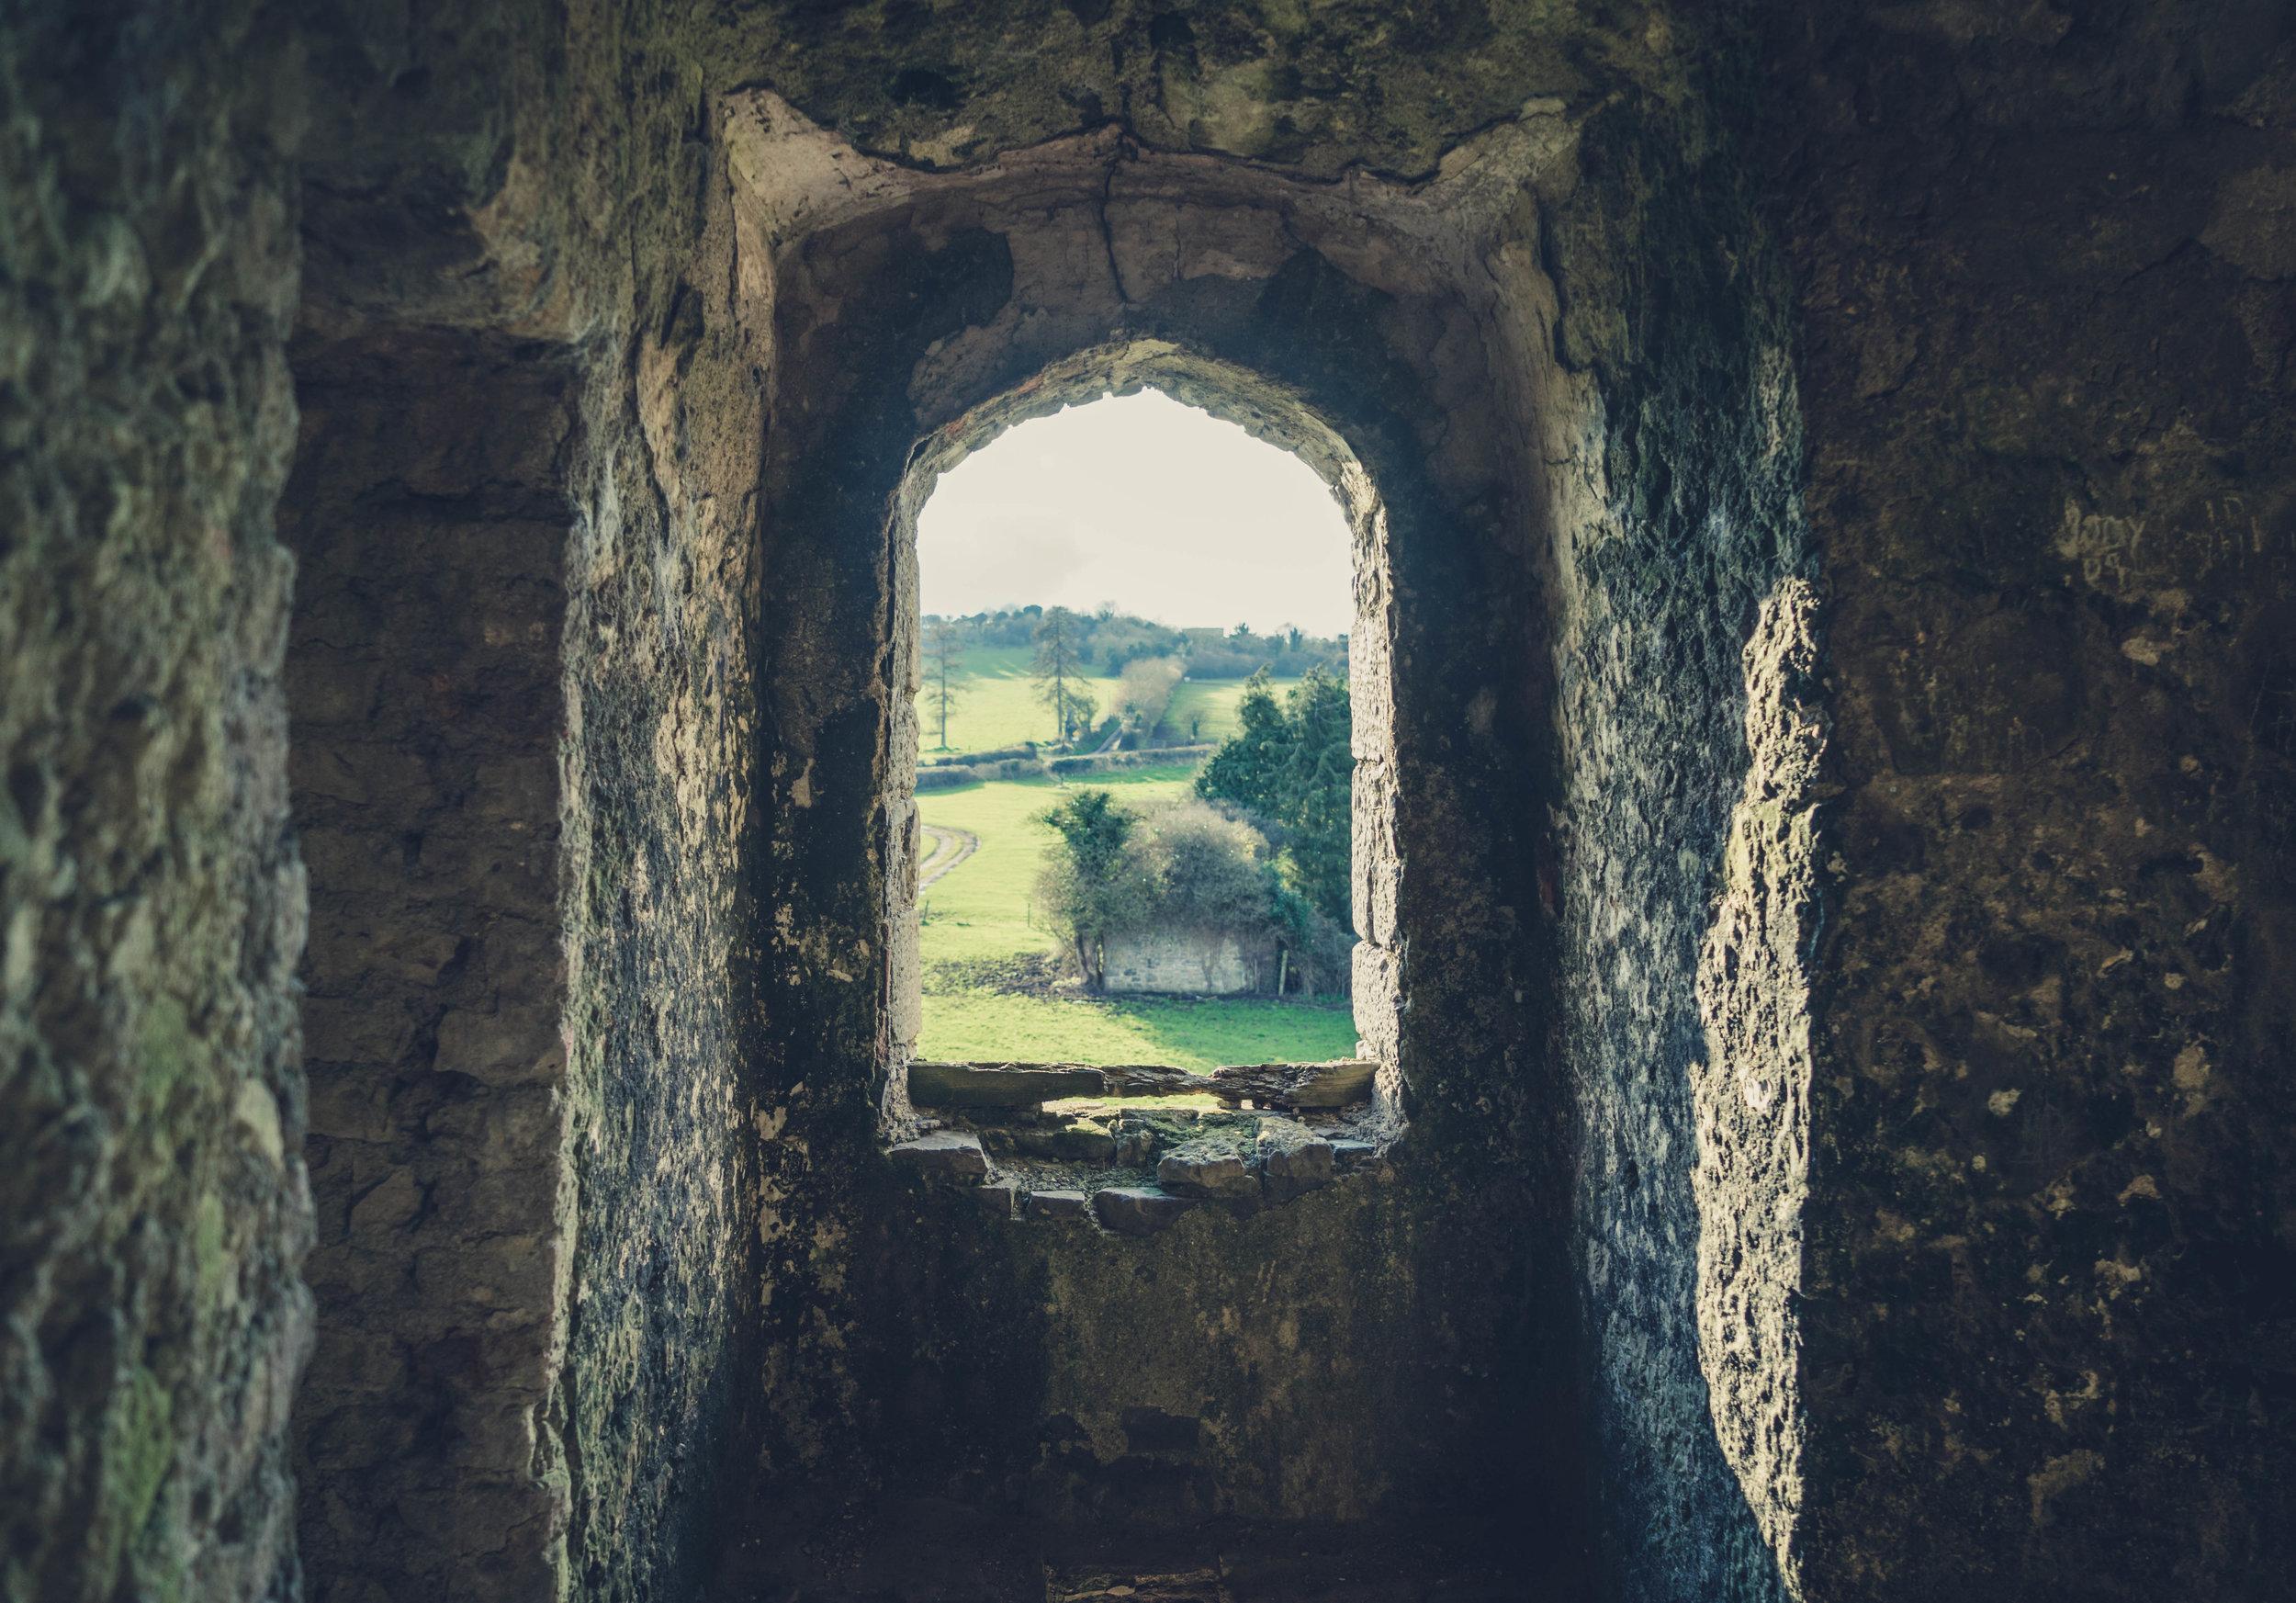 Ireland. Castle. Old castle. irish history. history. Rock of Dunamase. blue sky. rock. pathway. adventure. travel. irish counrty. Ballyadams castle.  window.jpg